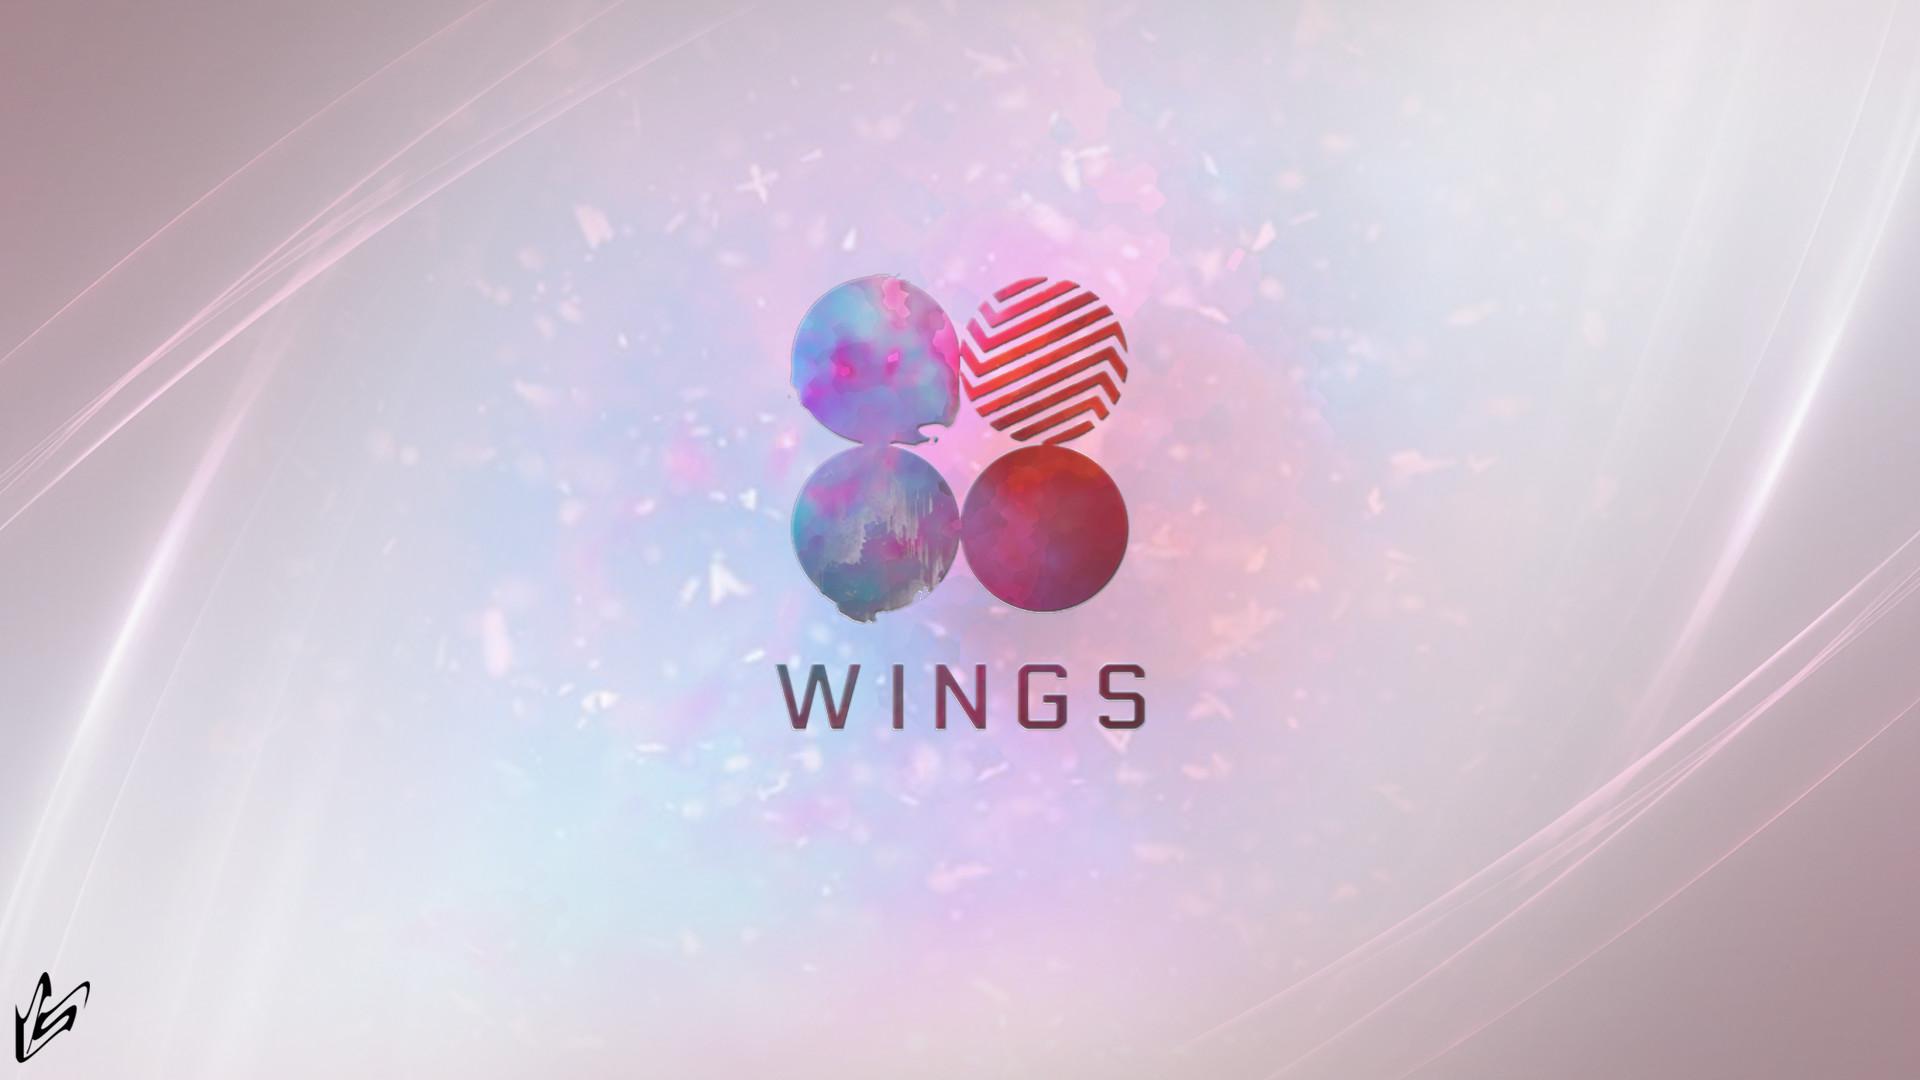 13+ BTS Wings Logo Wallpapers on WallpaperSafari